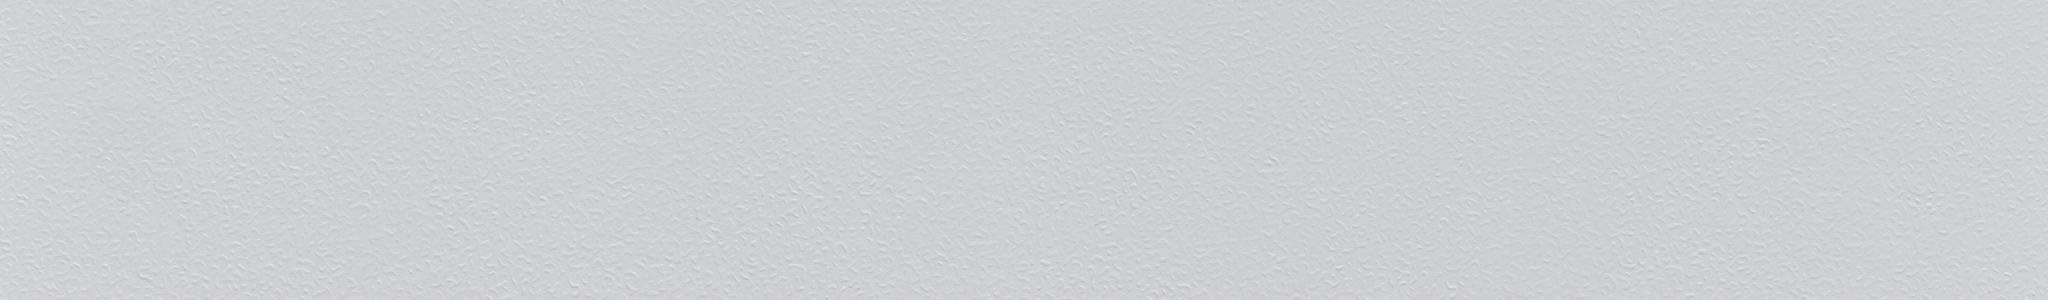 HU 57763 Melamine Edge FALZ Grey